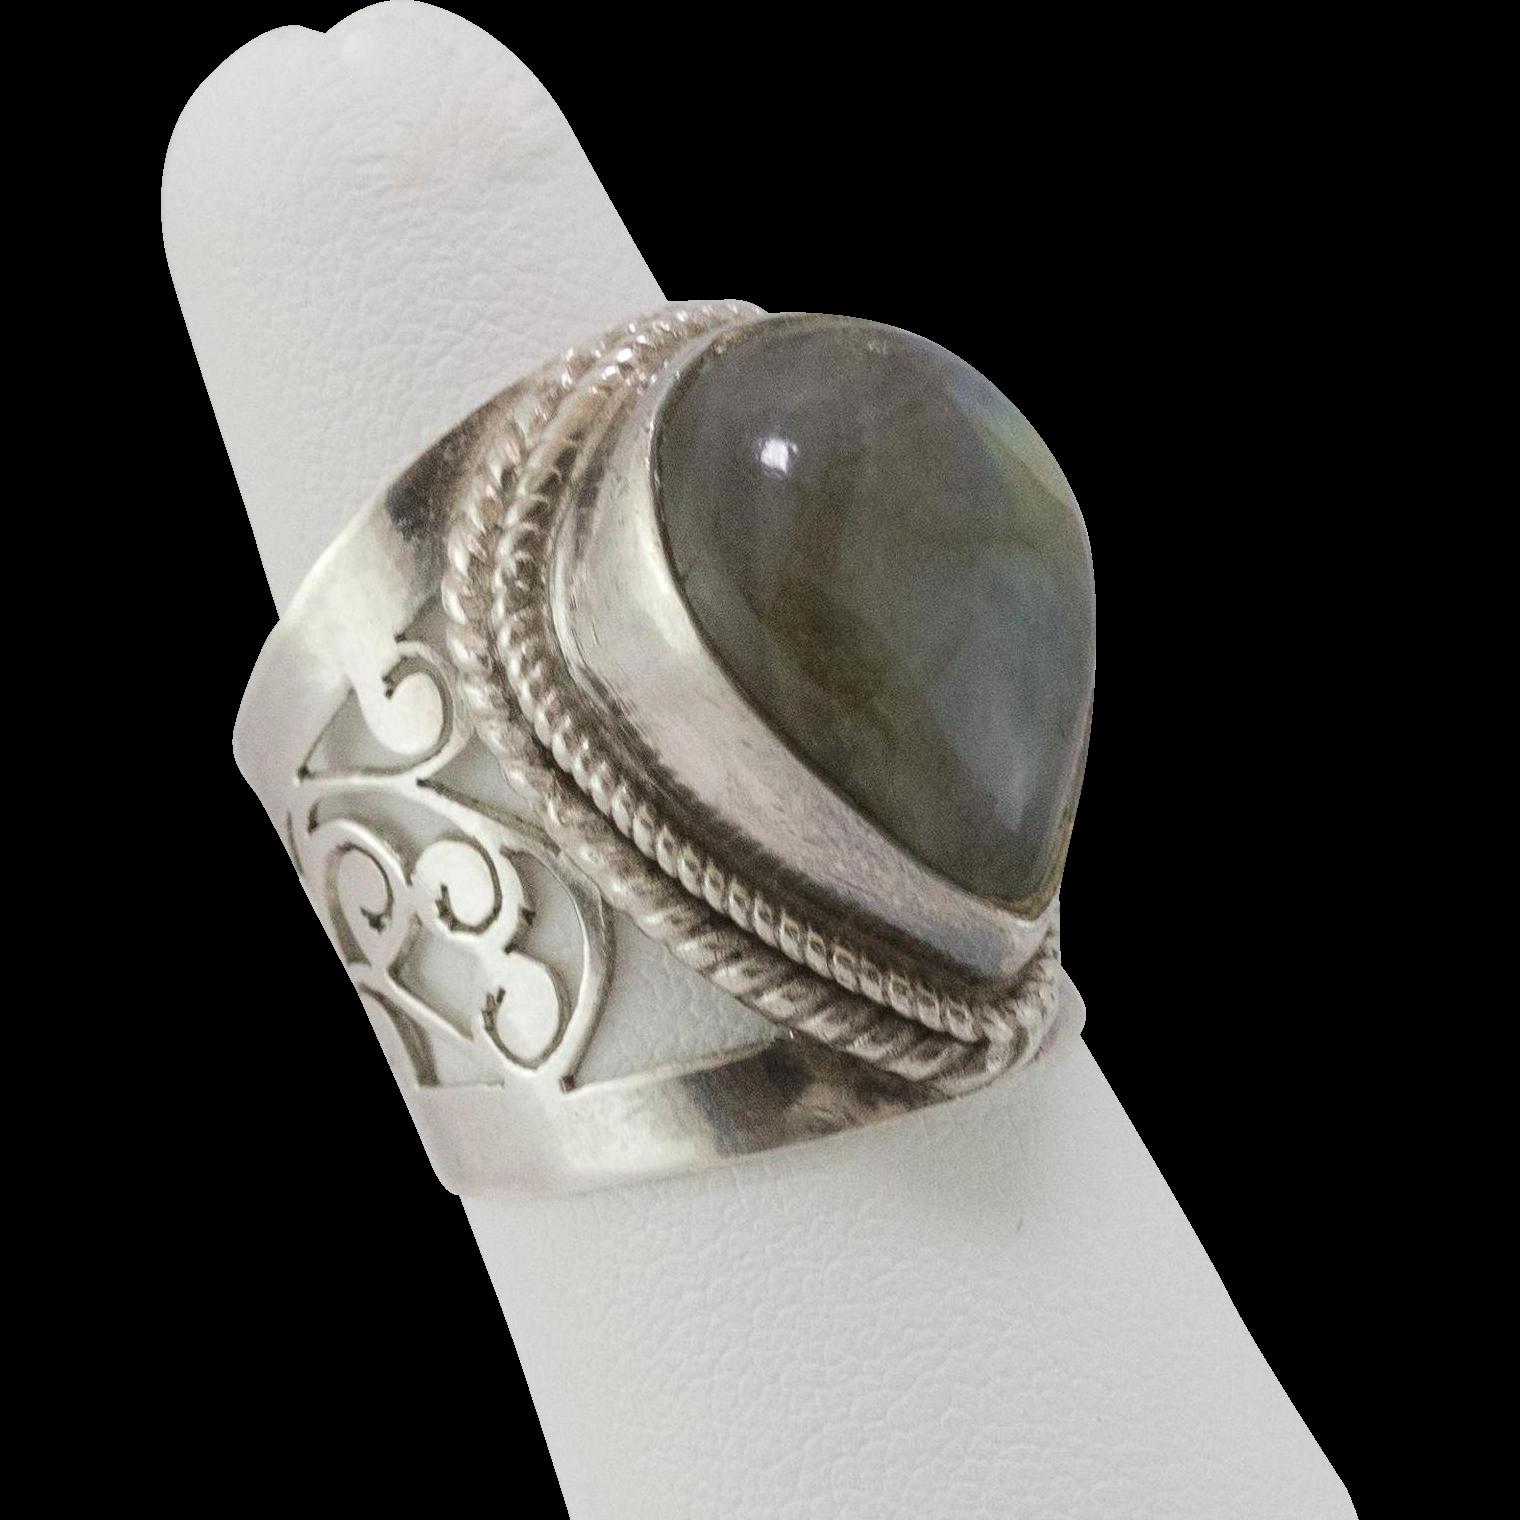 sterling silver labradorite ring from